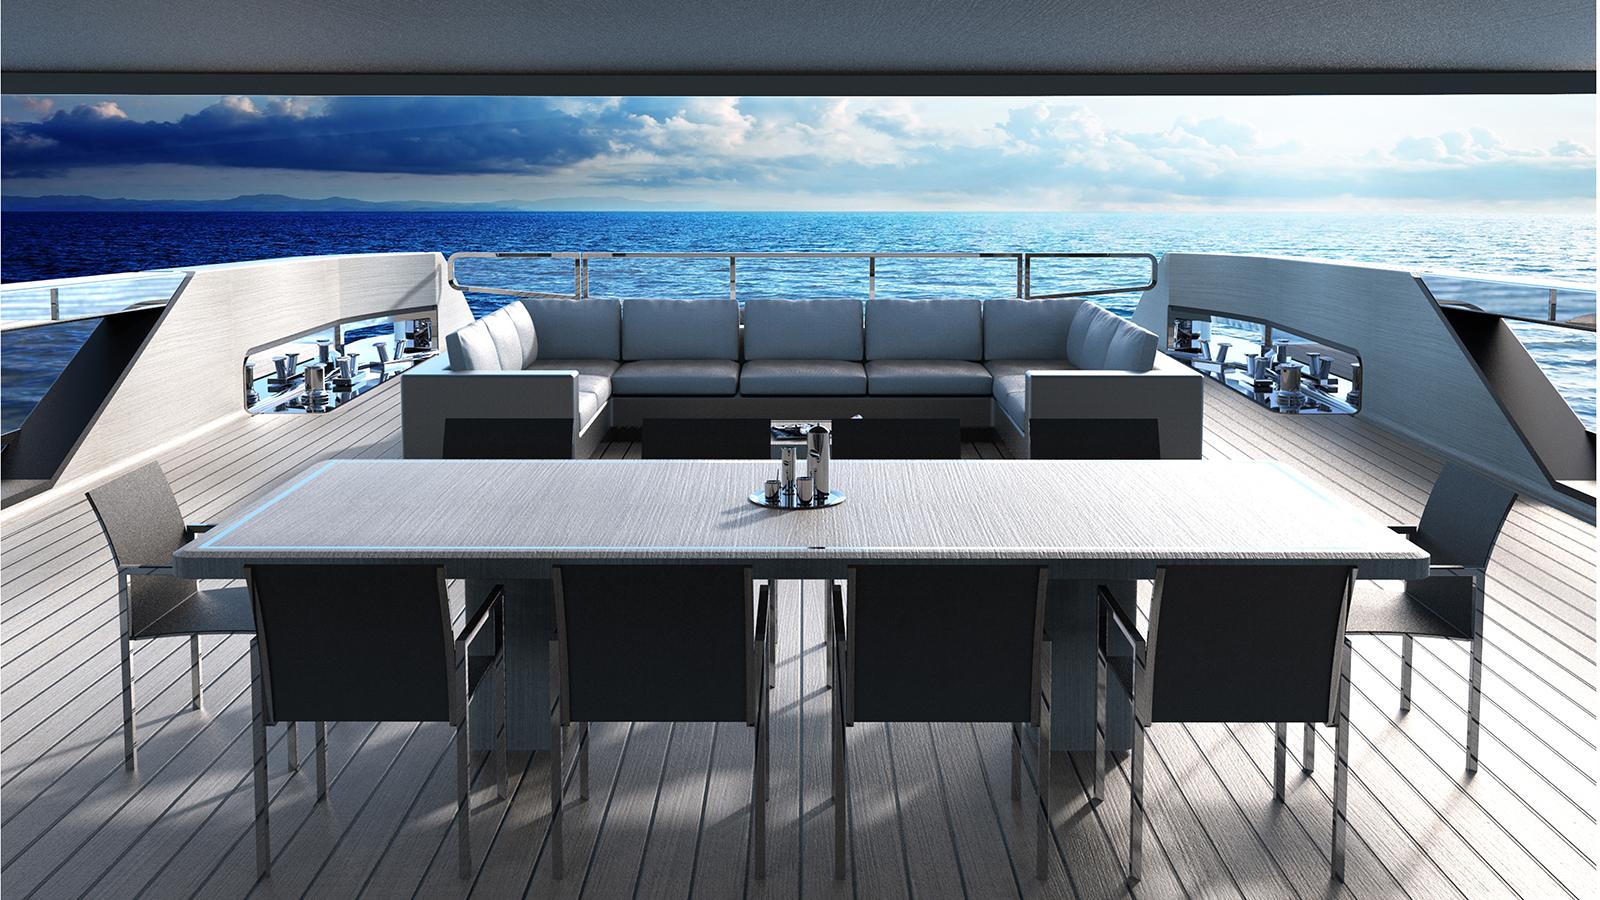 the-aft-deck-of-the-53-metre-tankoa-motor-yacht-saetta